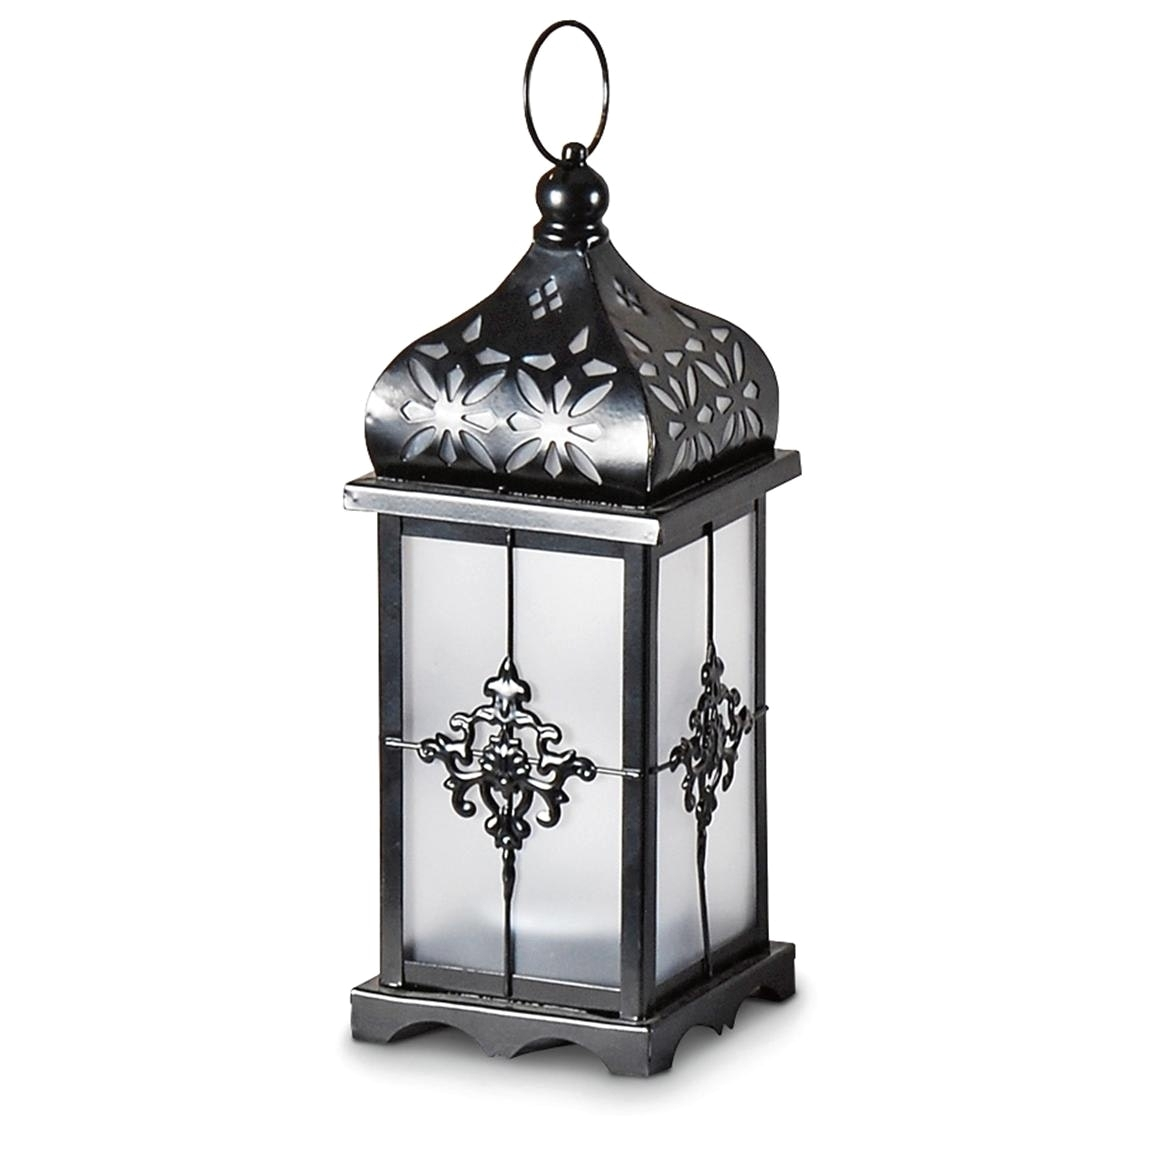 Solar Powered Outdoor Pendant Light – Outdoor Designs With Solar Powered Outdoor Hanging Lanterns (#15 of 15)